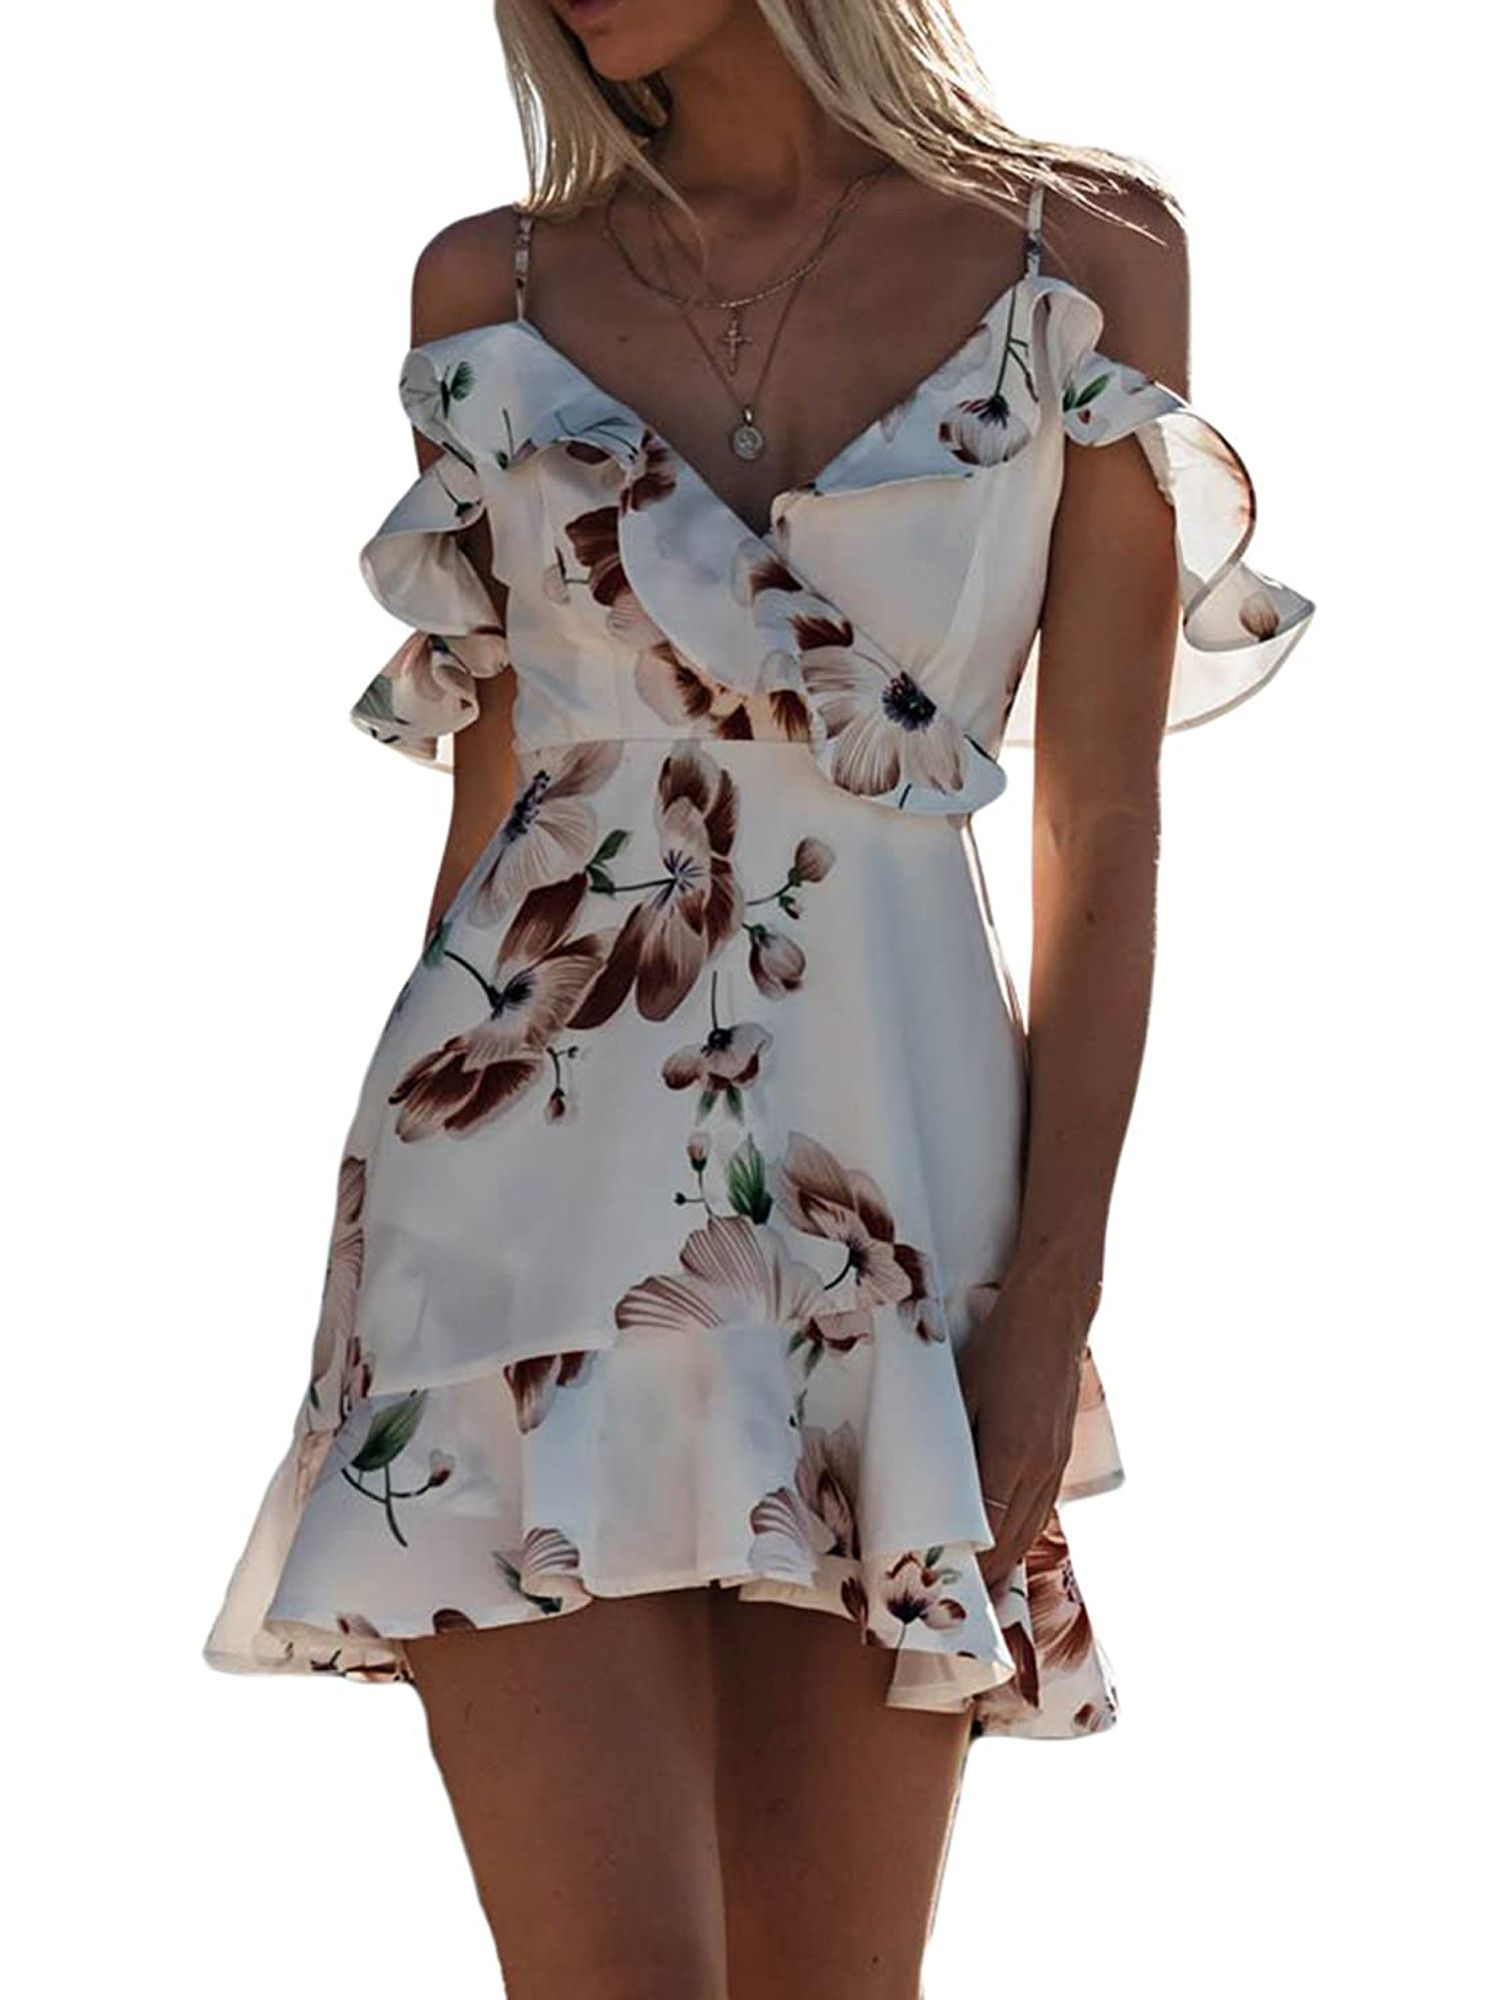 Ma Baby Womens Boho Floral Chiffon Summer Party Beach Short Mini Dress Sundress Chiffon Summer Dress Short Summer Dresses Boho Summer Dresses [ 2000 x 1500 Pixel ]